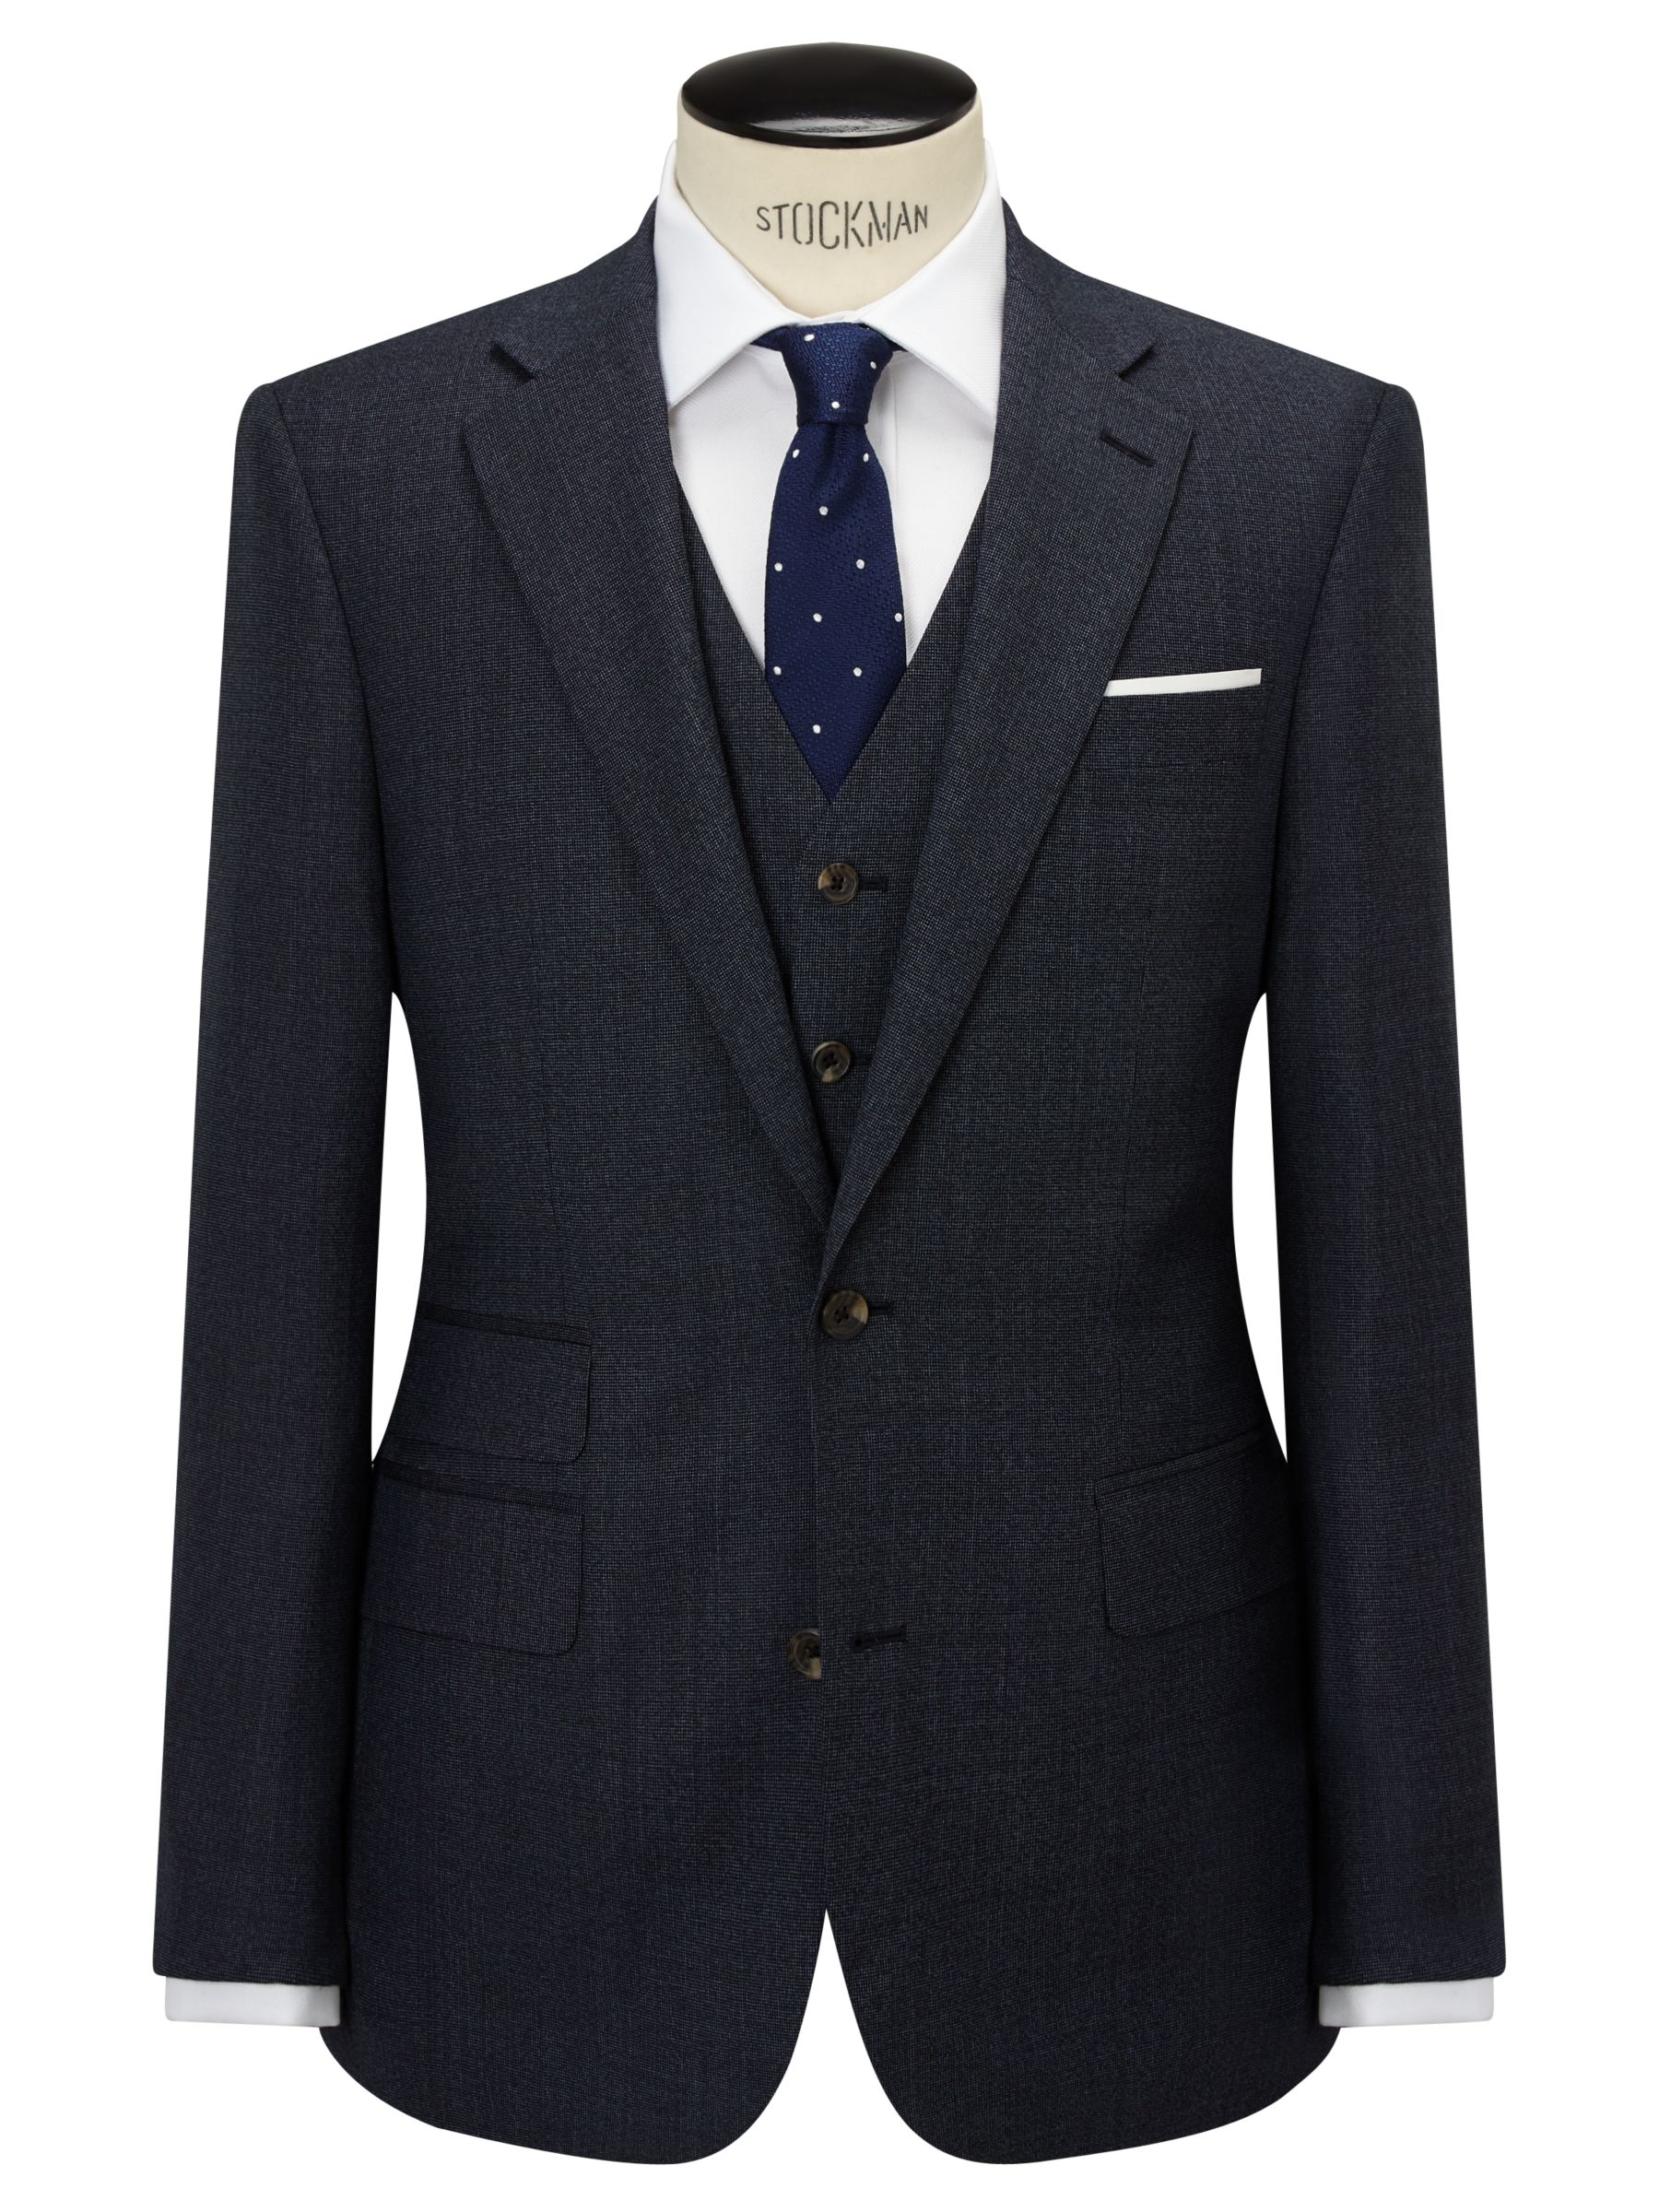 Chester by Chester Barrie Chester by Chester Barrie Pindot Wool Tailored Suit Jacket, Airforce